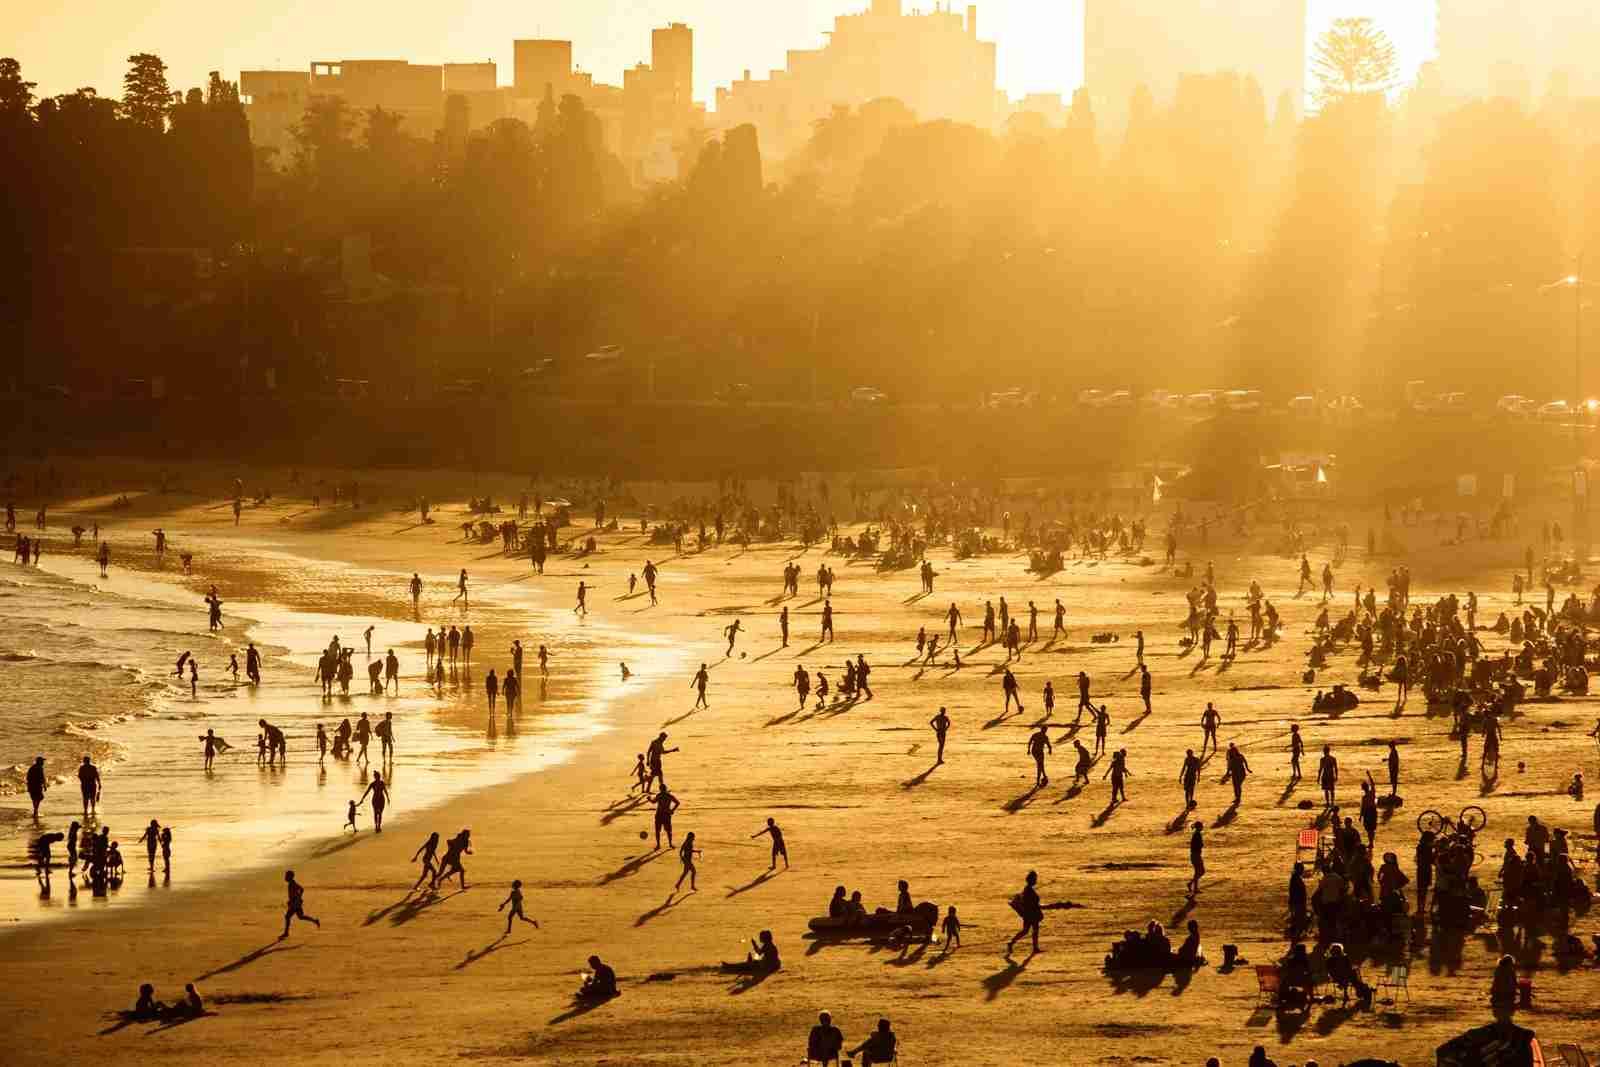 sunset, Montevideo, Uruguay.